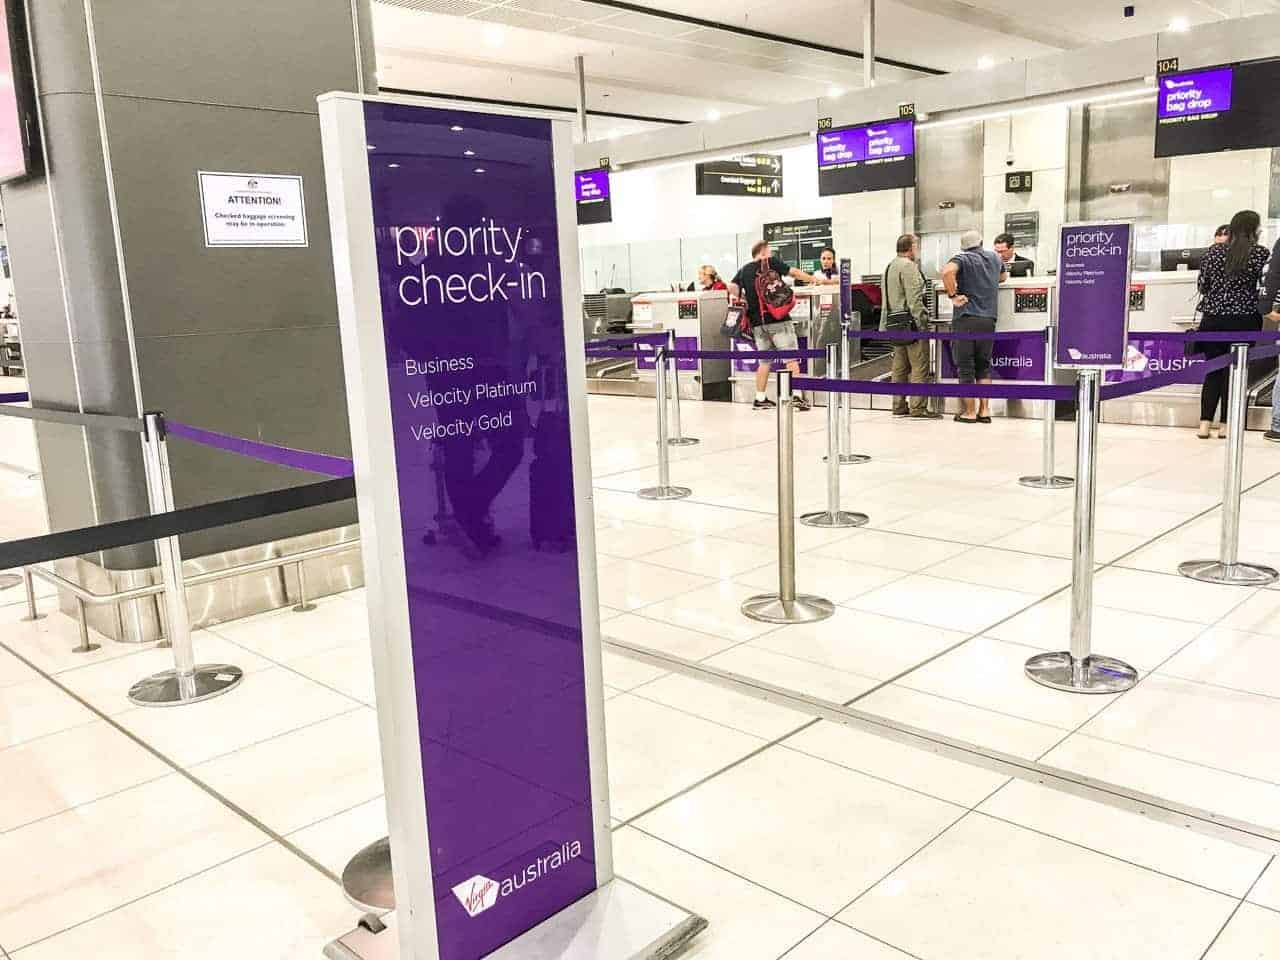 Virgin Australia priority check-in line at airport